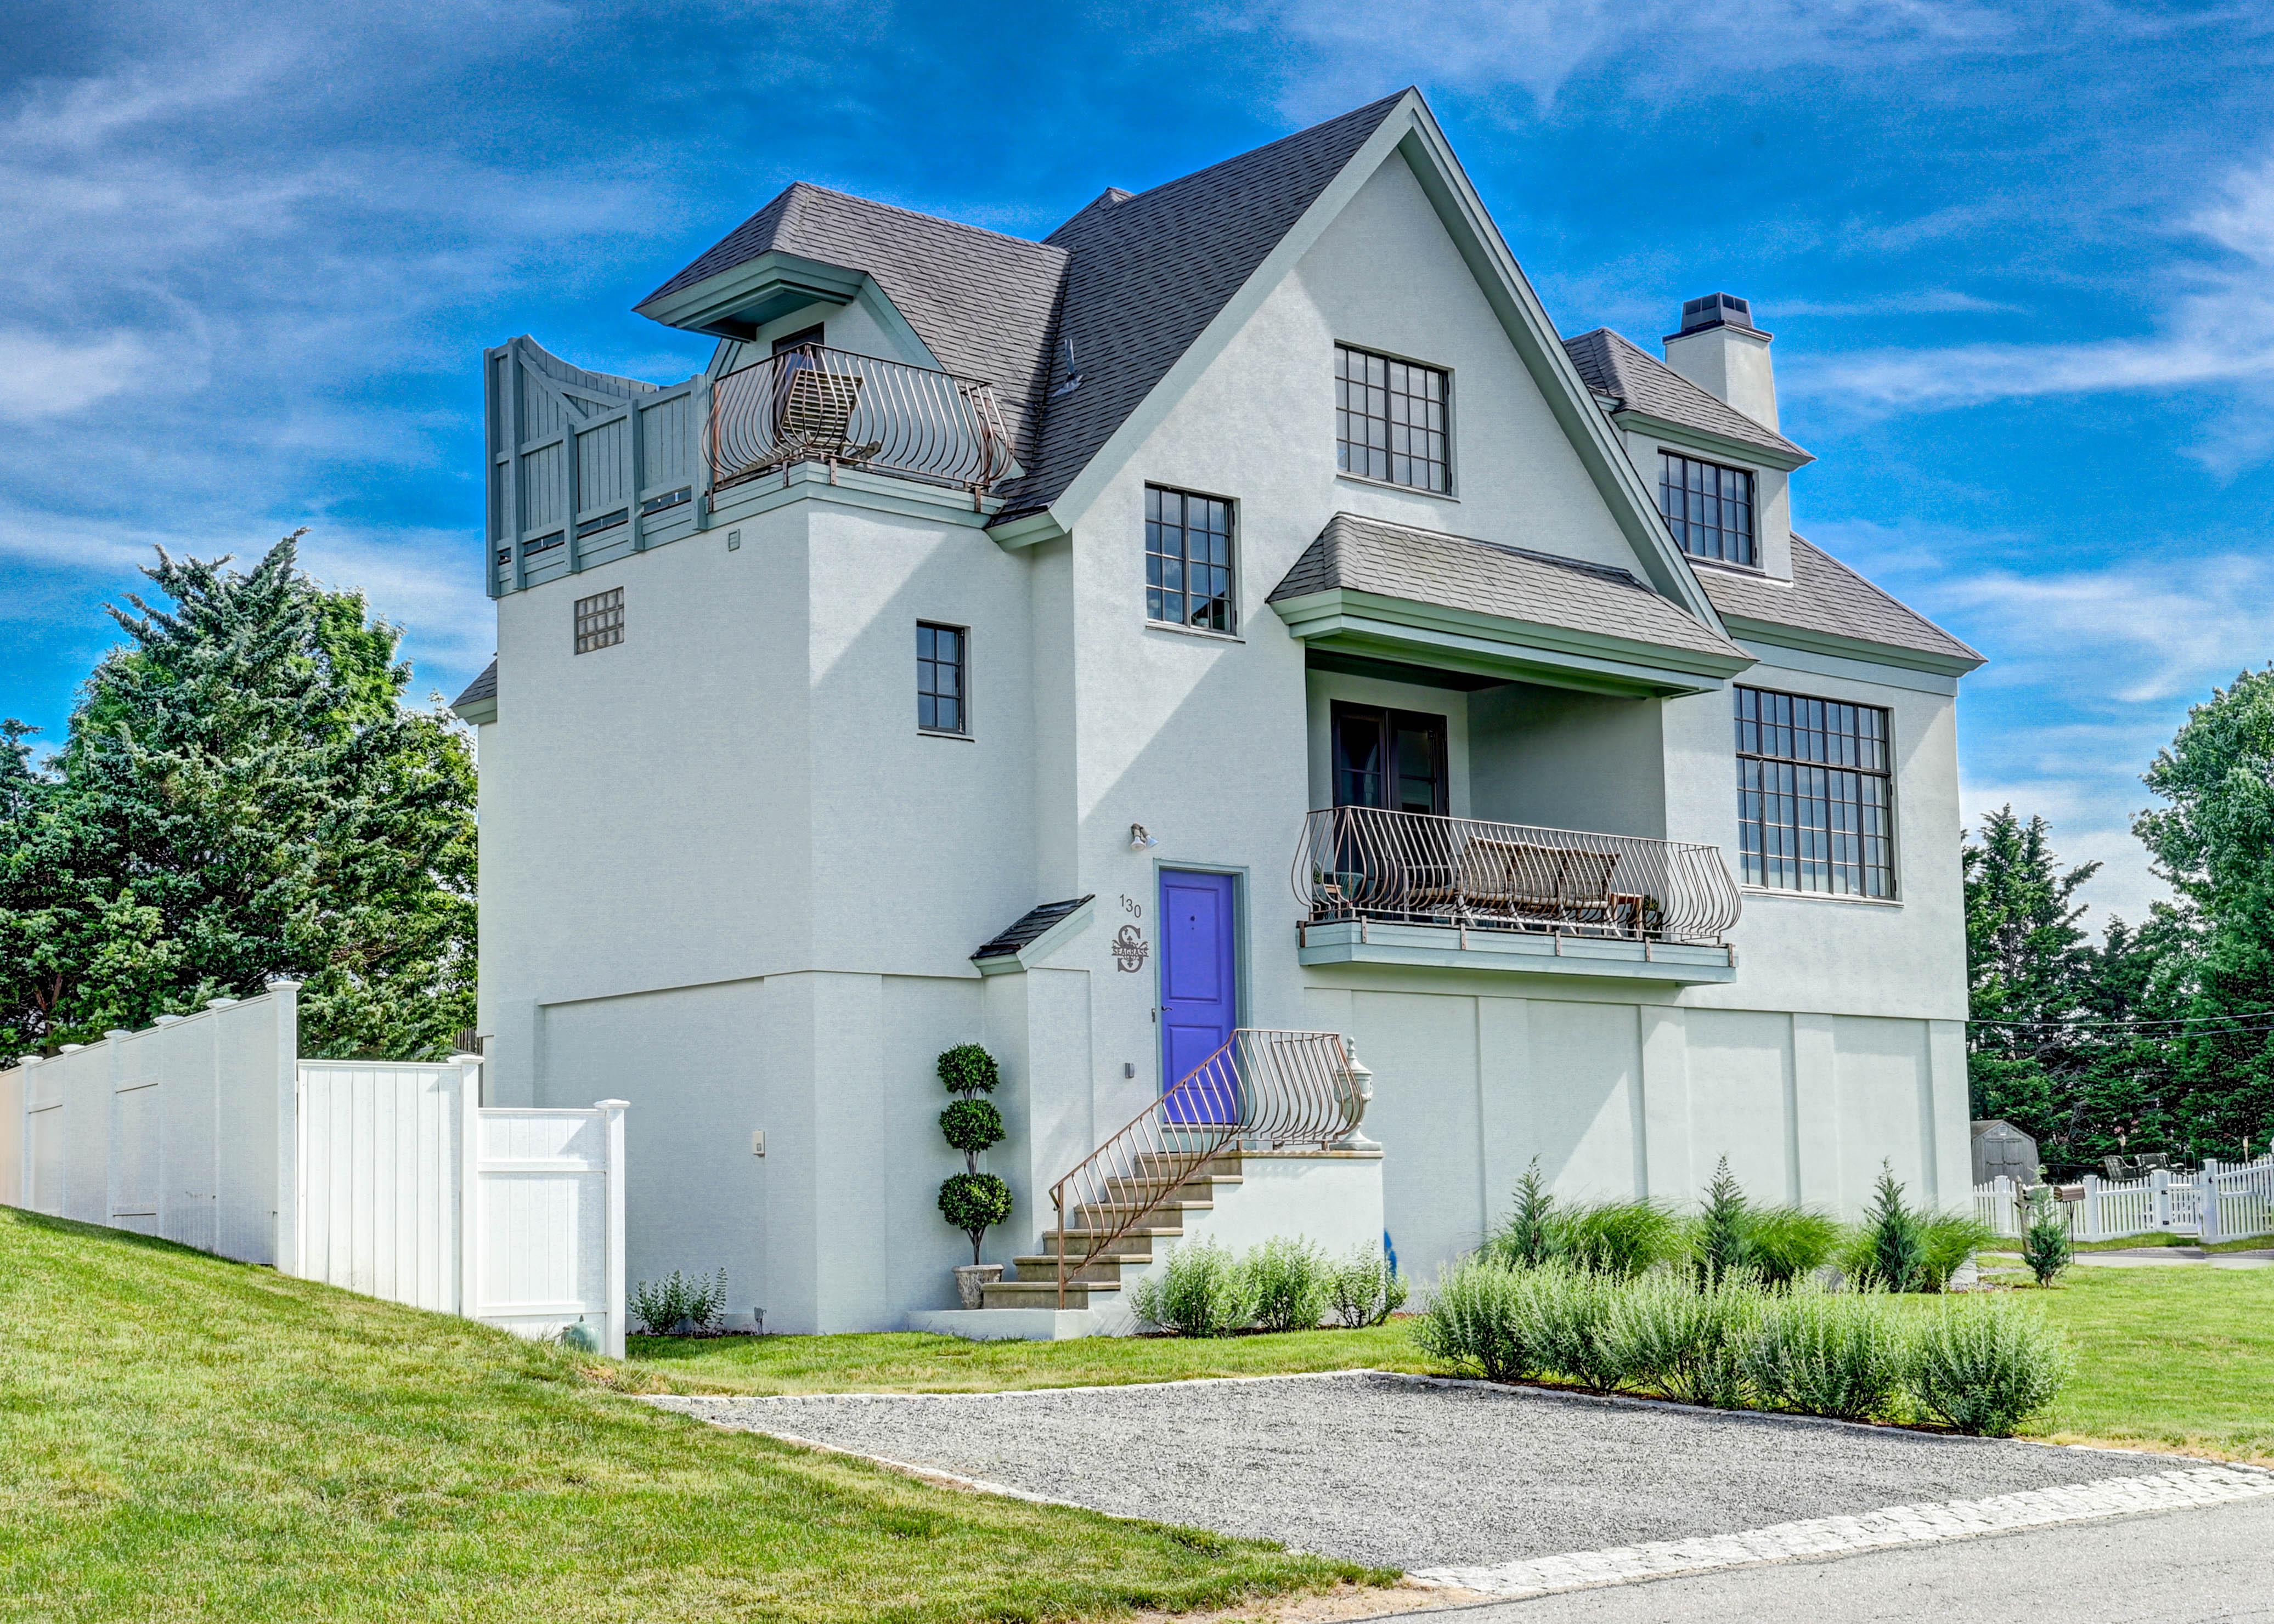 130-common-fence-portsmouth-ri-exterior